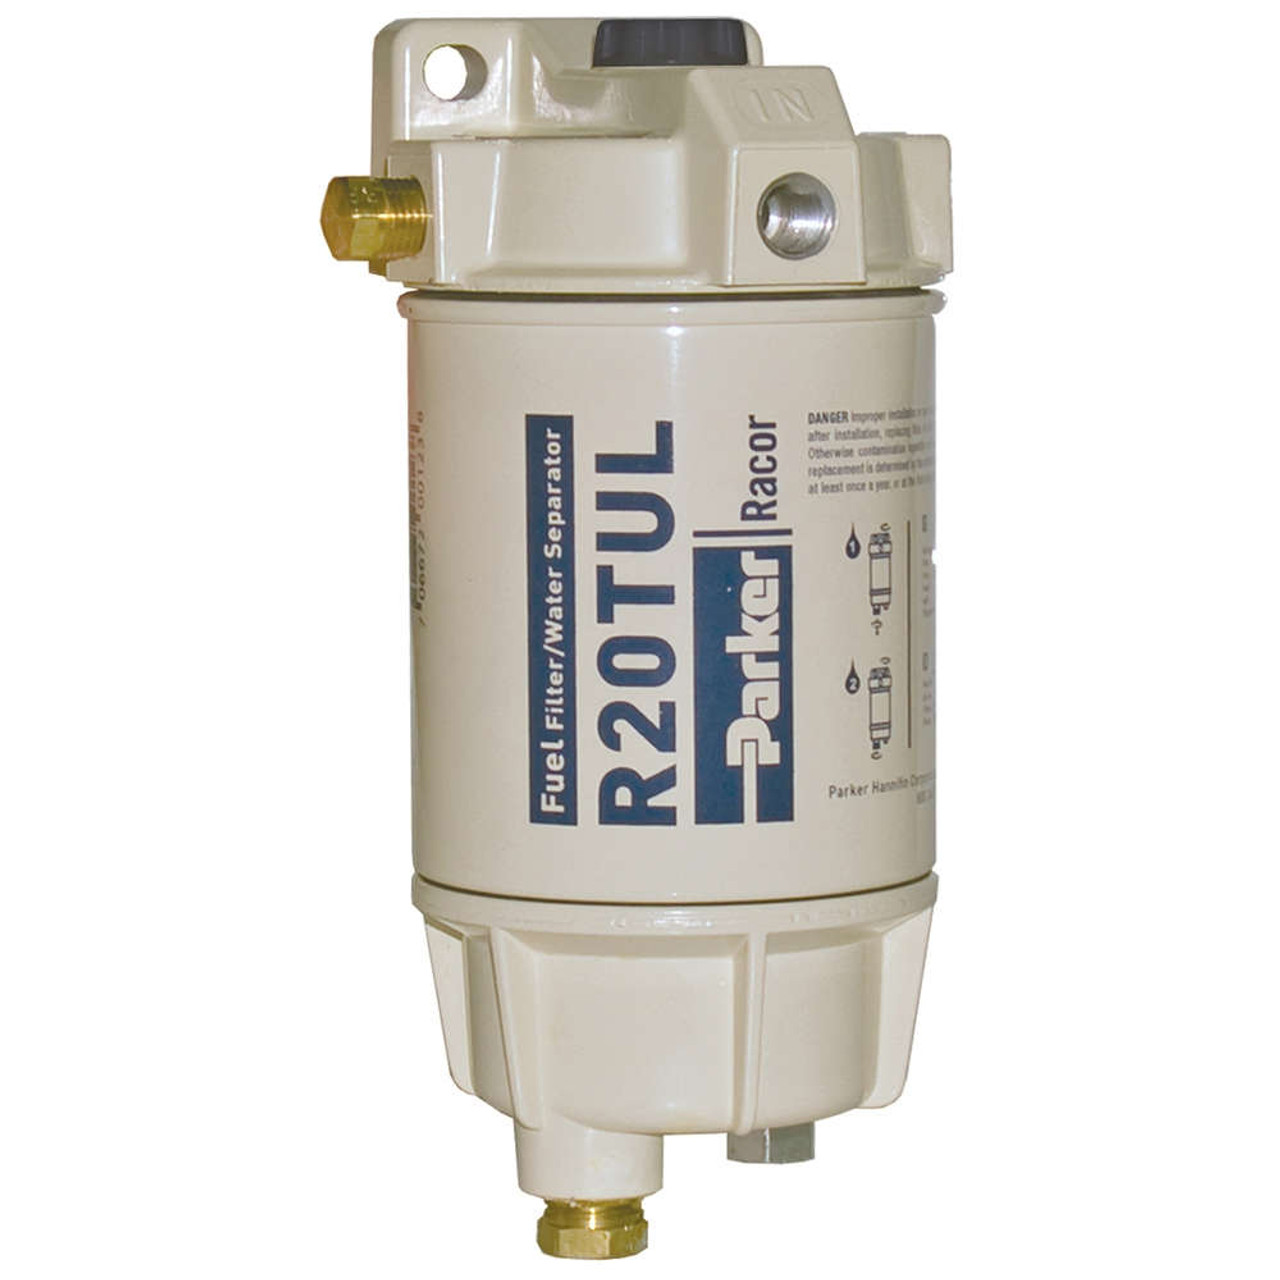 medium resolution of racor 1 4 in 30 gph aquabloc marine spin on type diesel fuel filterracor 1 4 in 30 gph aquabloc marine spin on type diesel fuel filter water separator